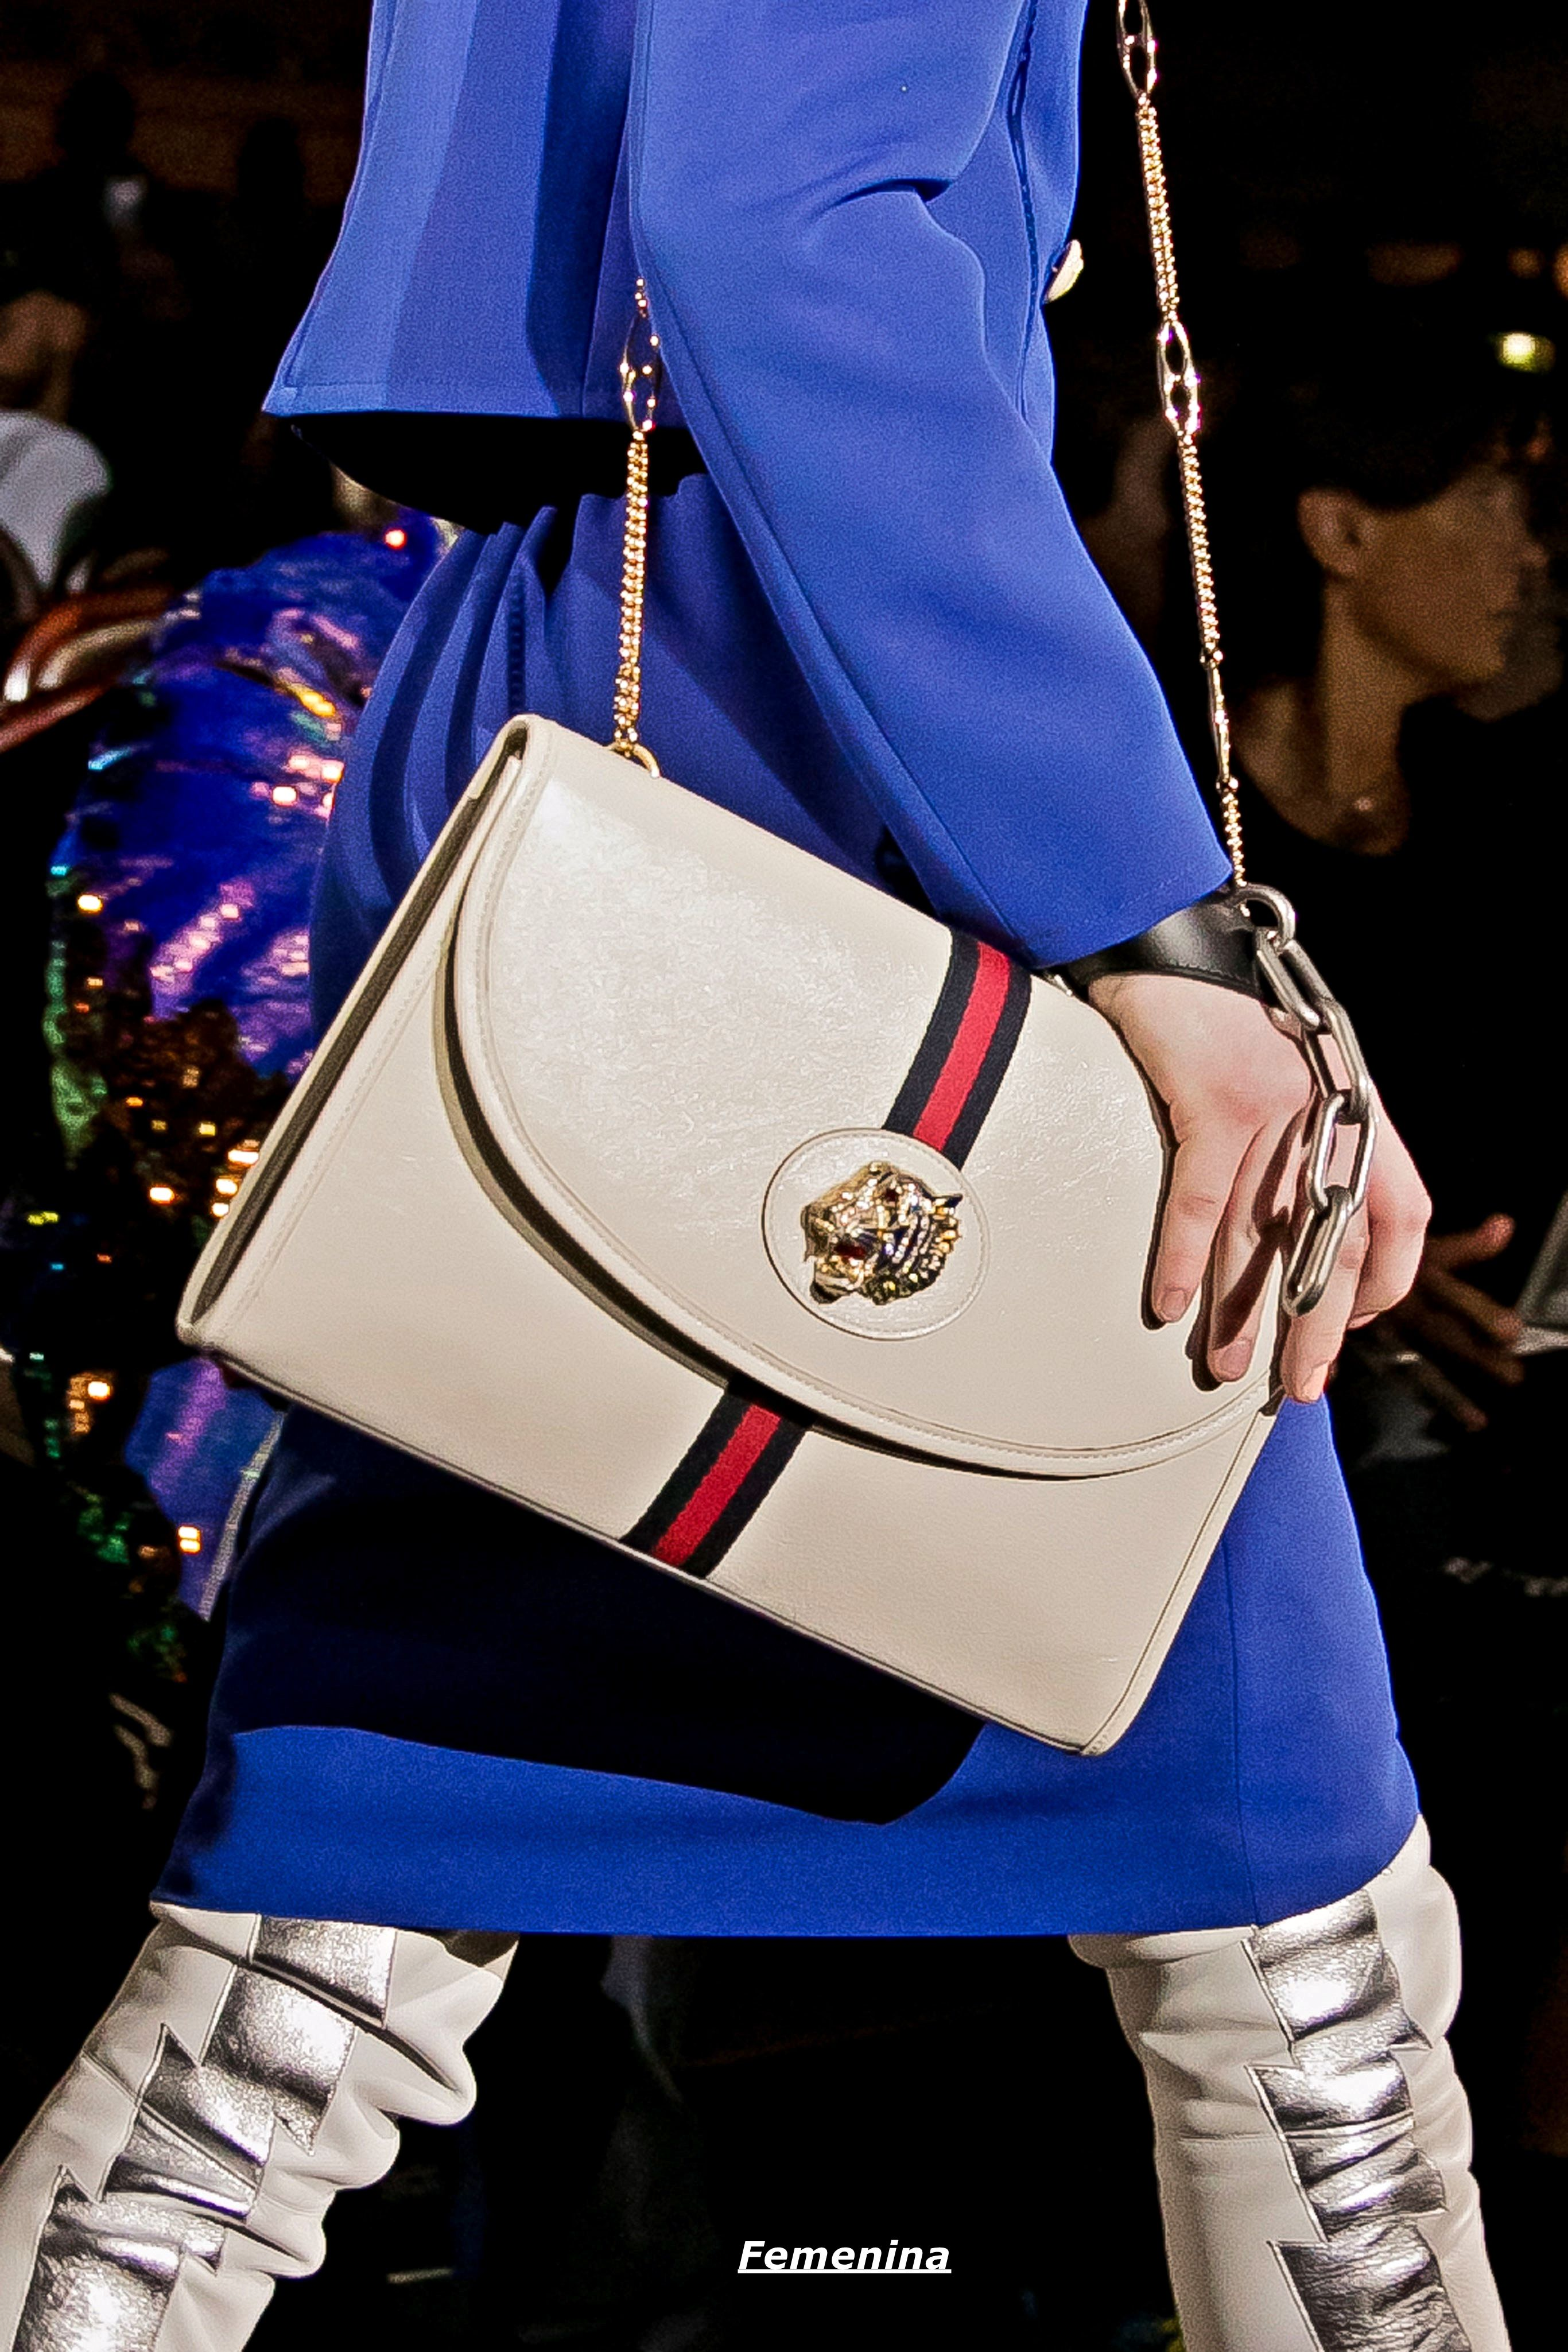 eff742ad5c7b Gucci Spring/Summer 2019 RTW -Details #bag | GUCCI in 2019 | Gucci ...